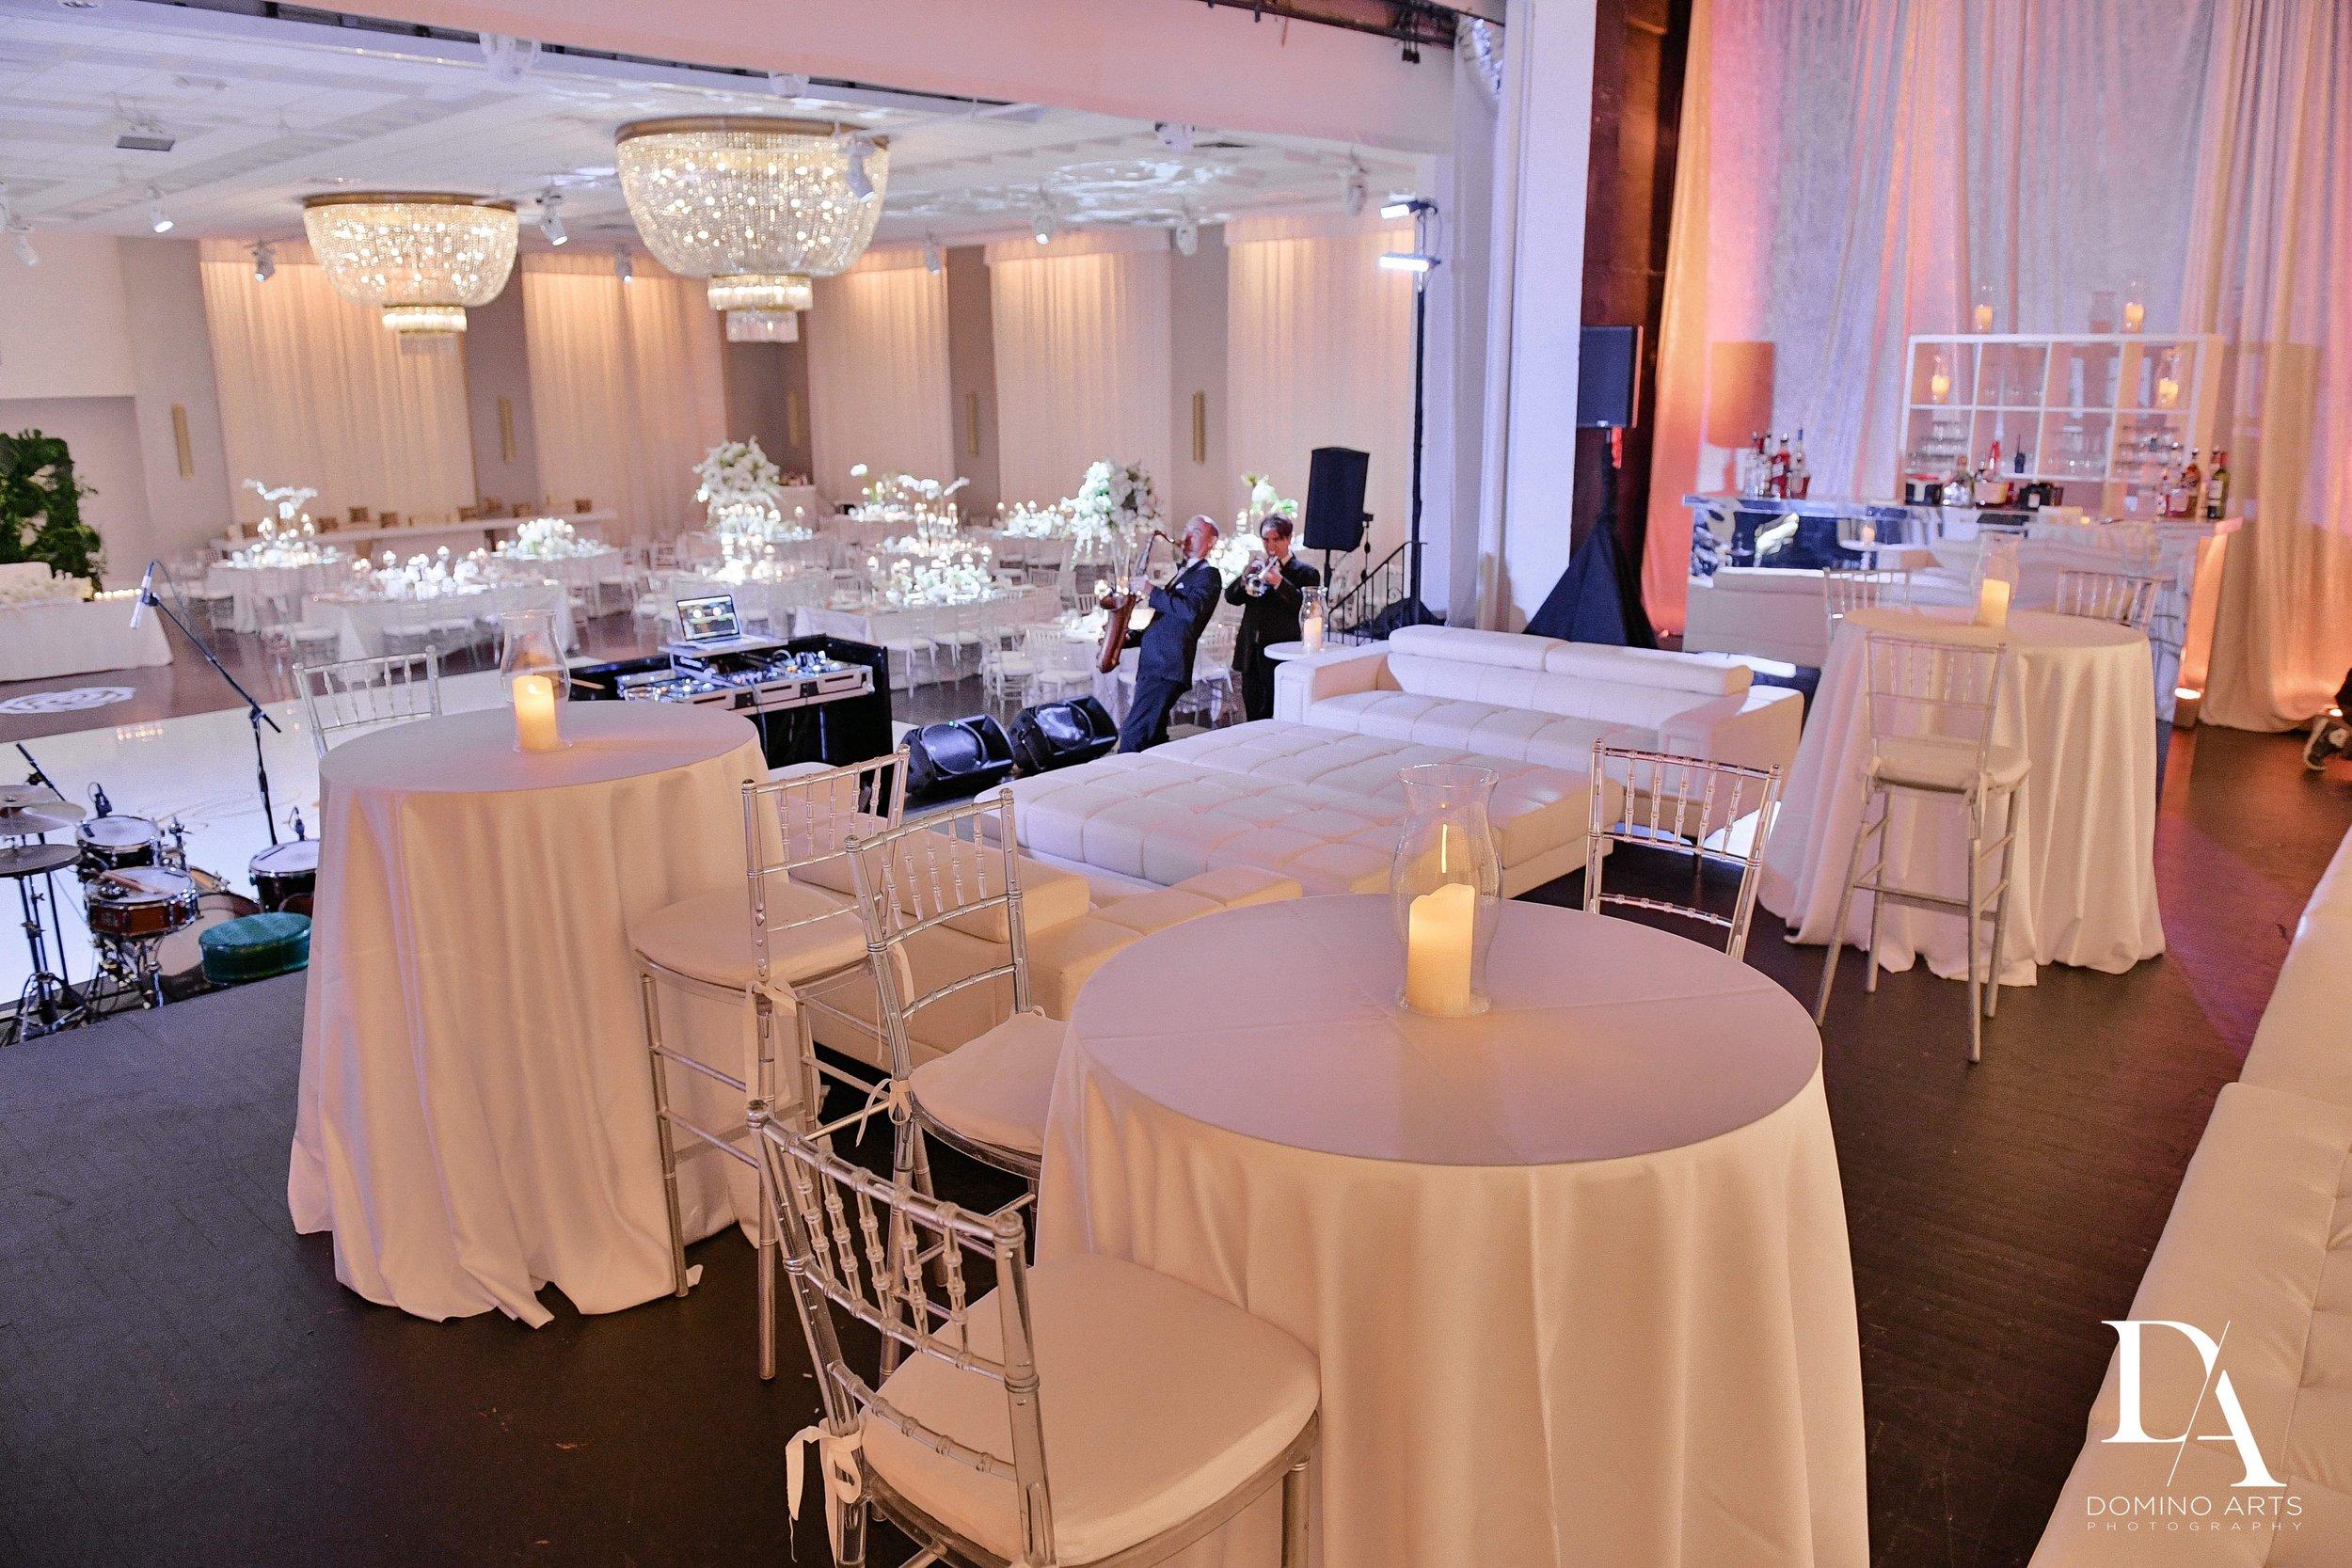 Miami Beach Beautiful Wedding Venue Decor .jpg